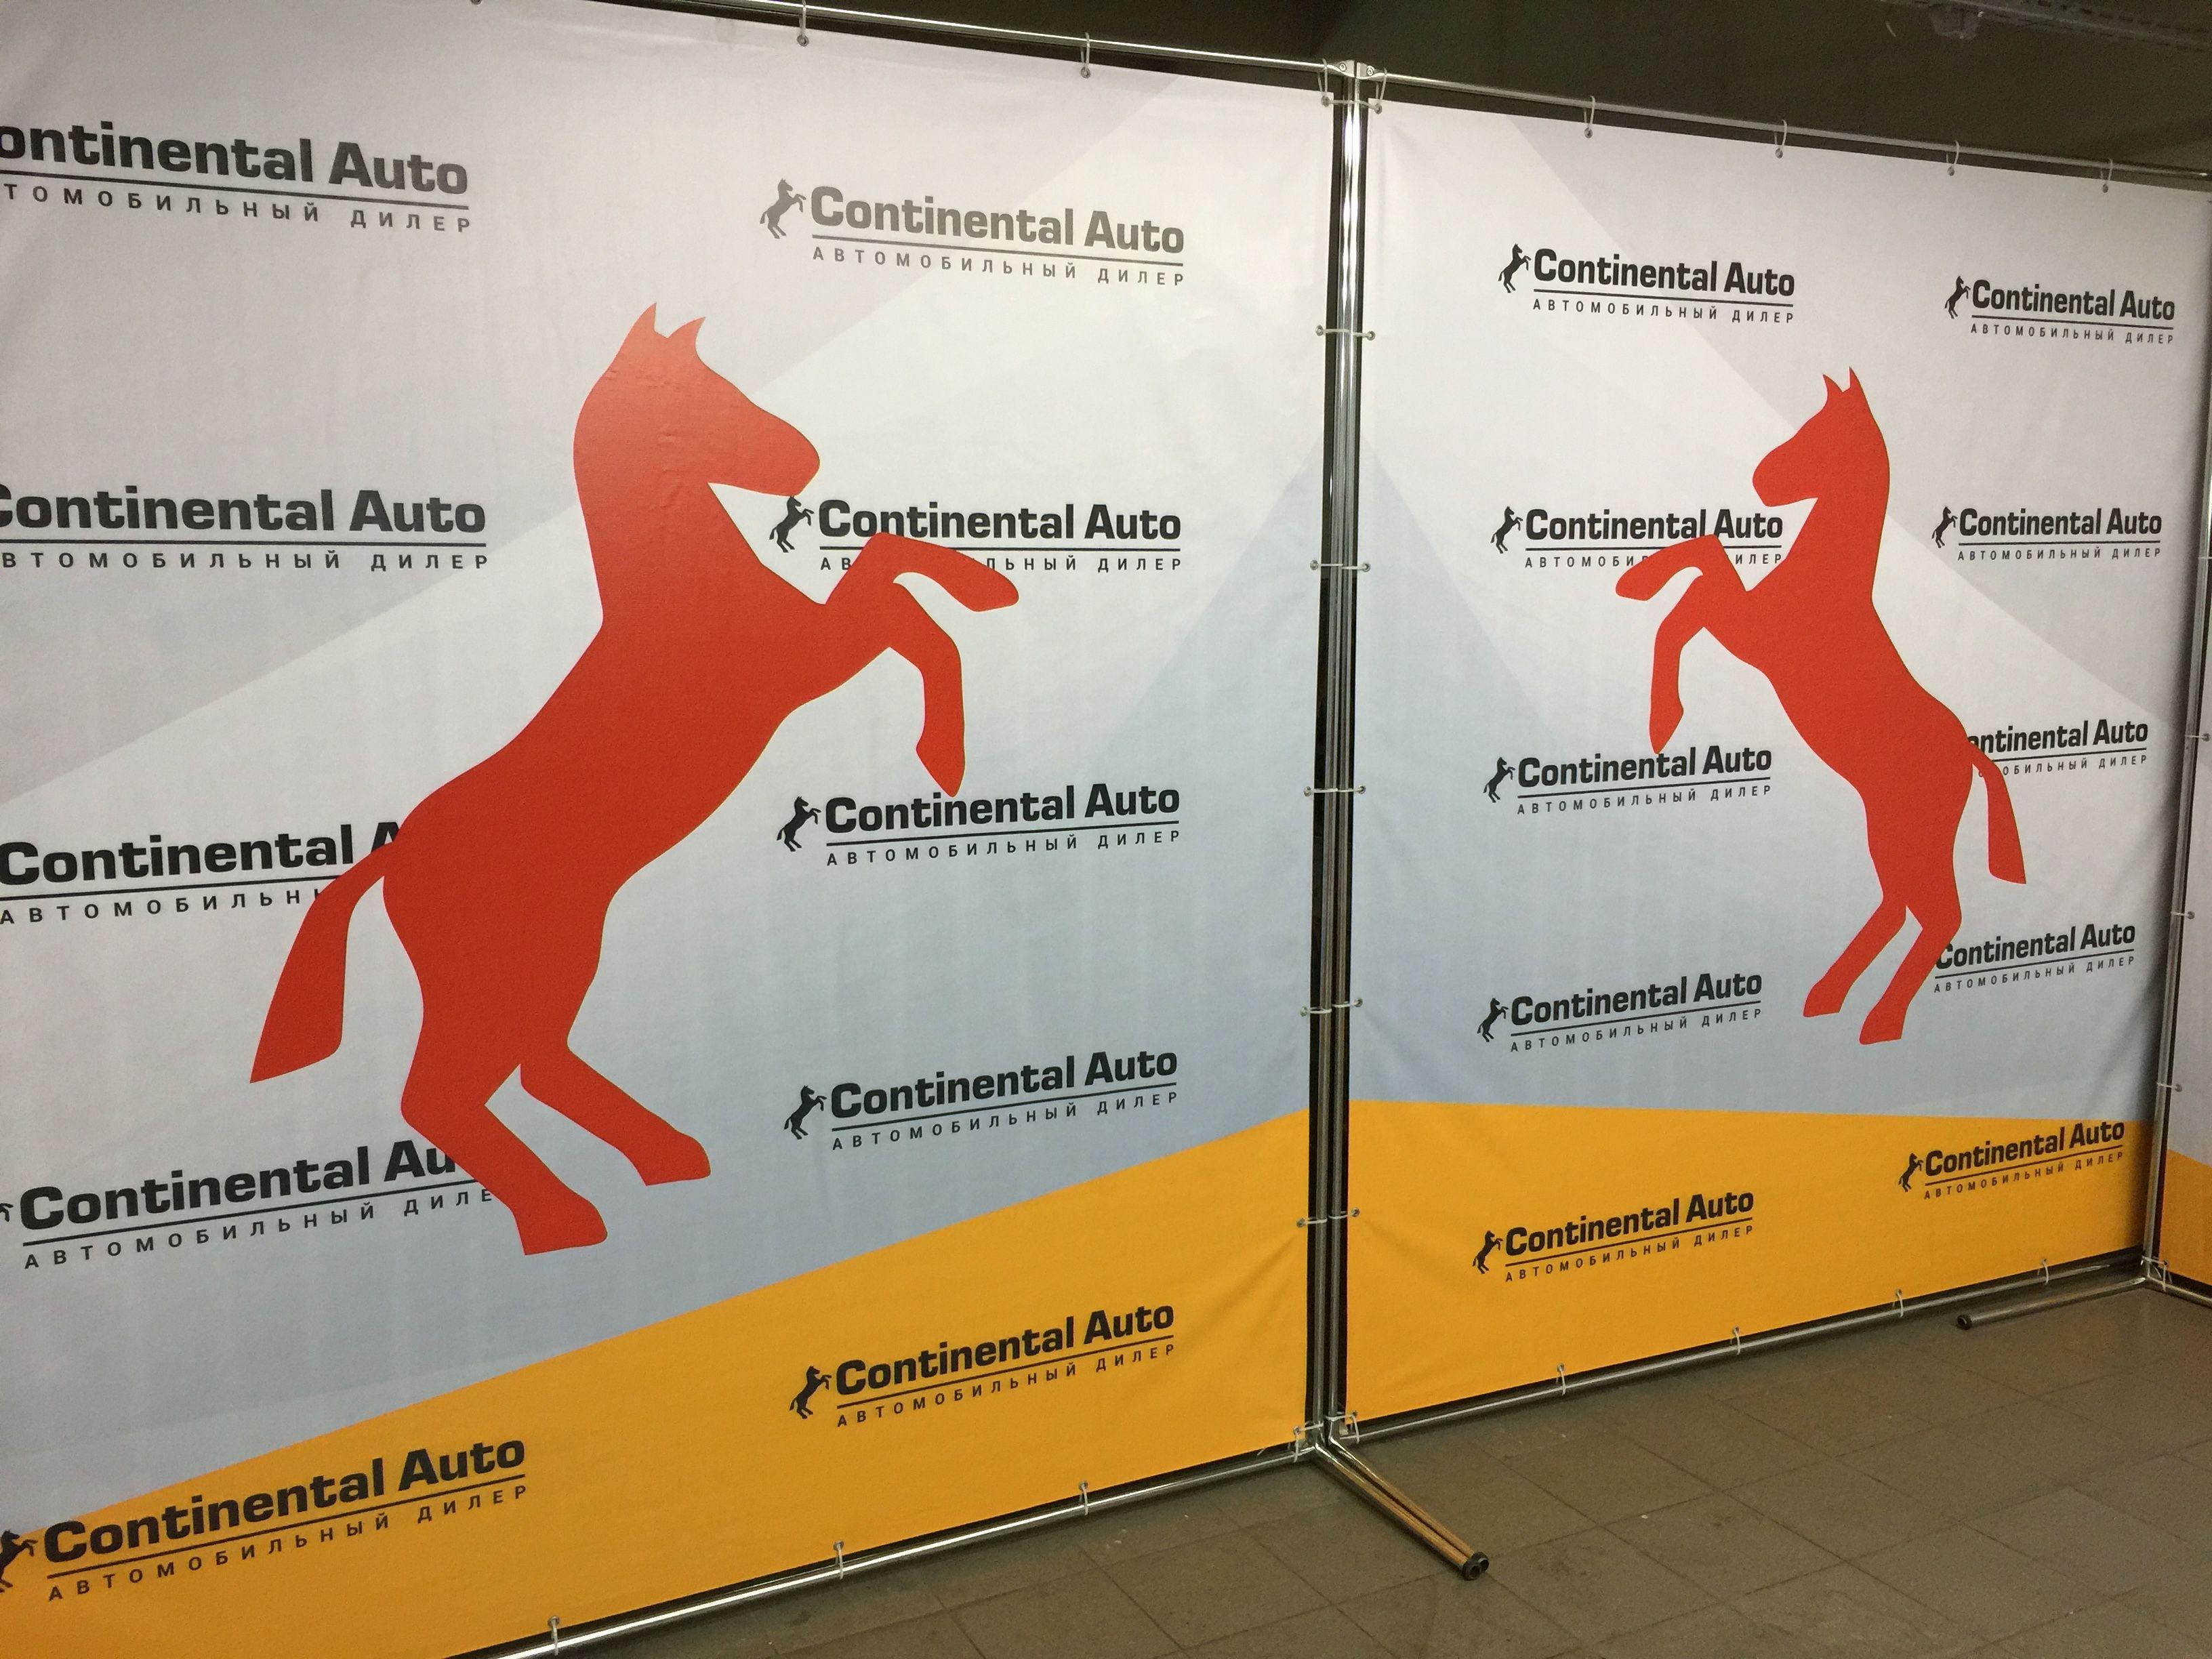 Производство, монтаж, баннеры, наружная реклама, автосалон, Continental Auto